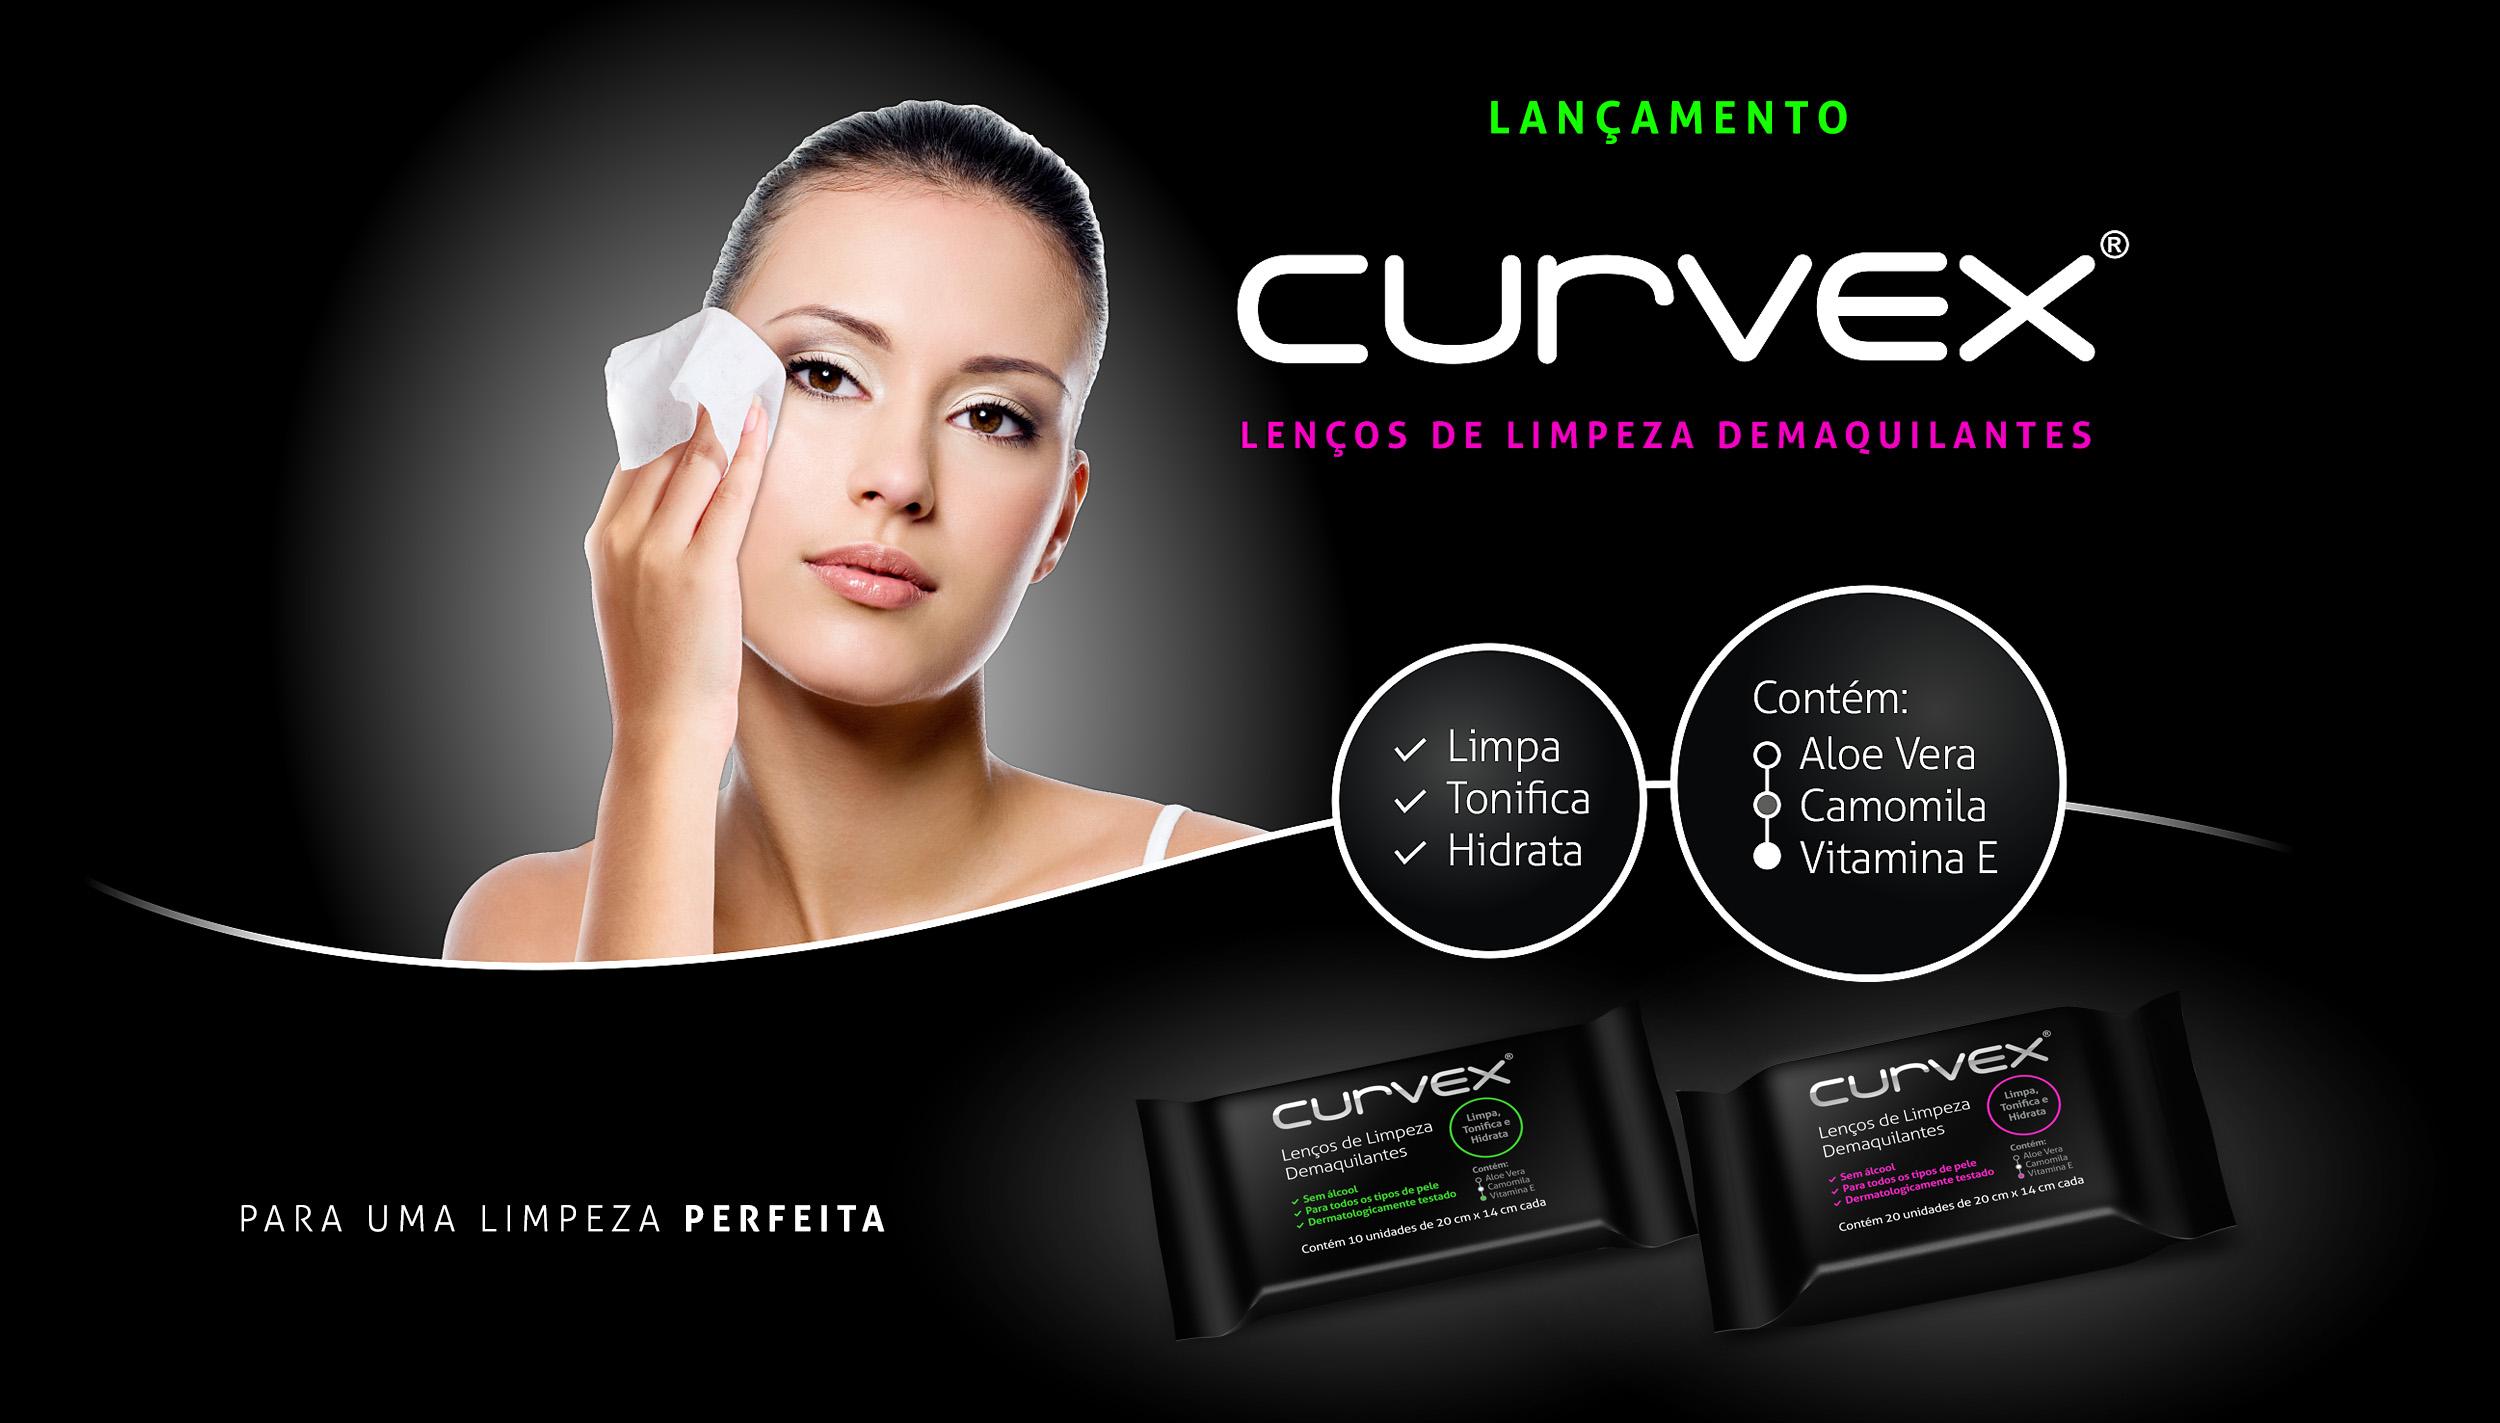 curvex - lencos2